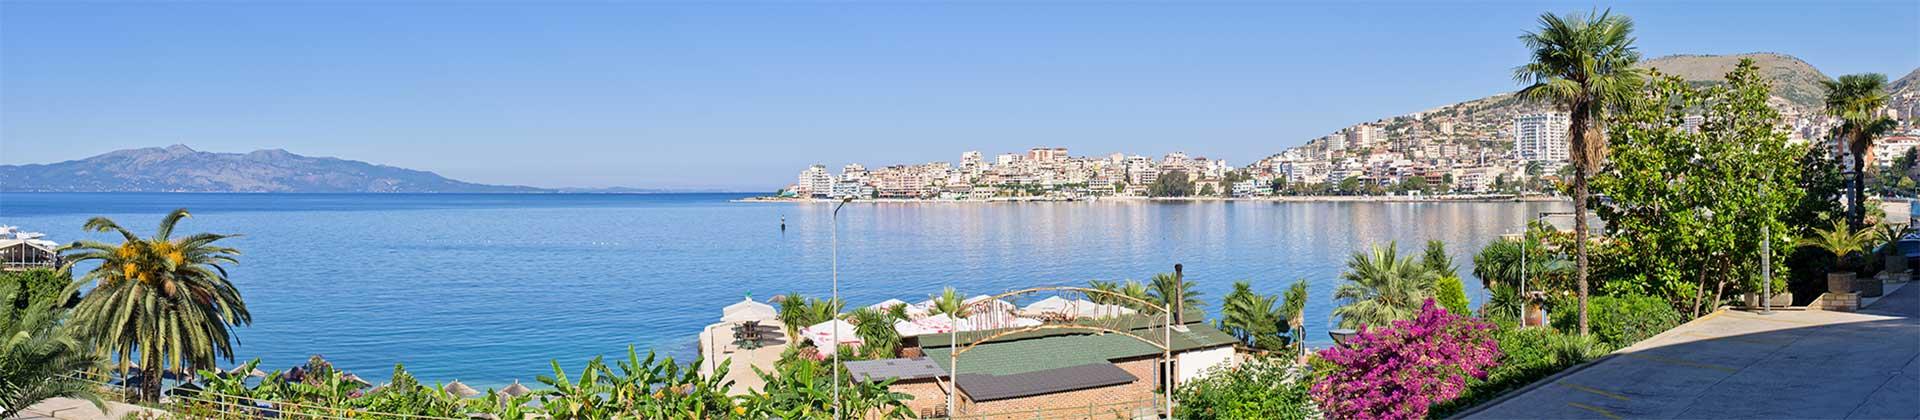 Albanien Hotels